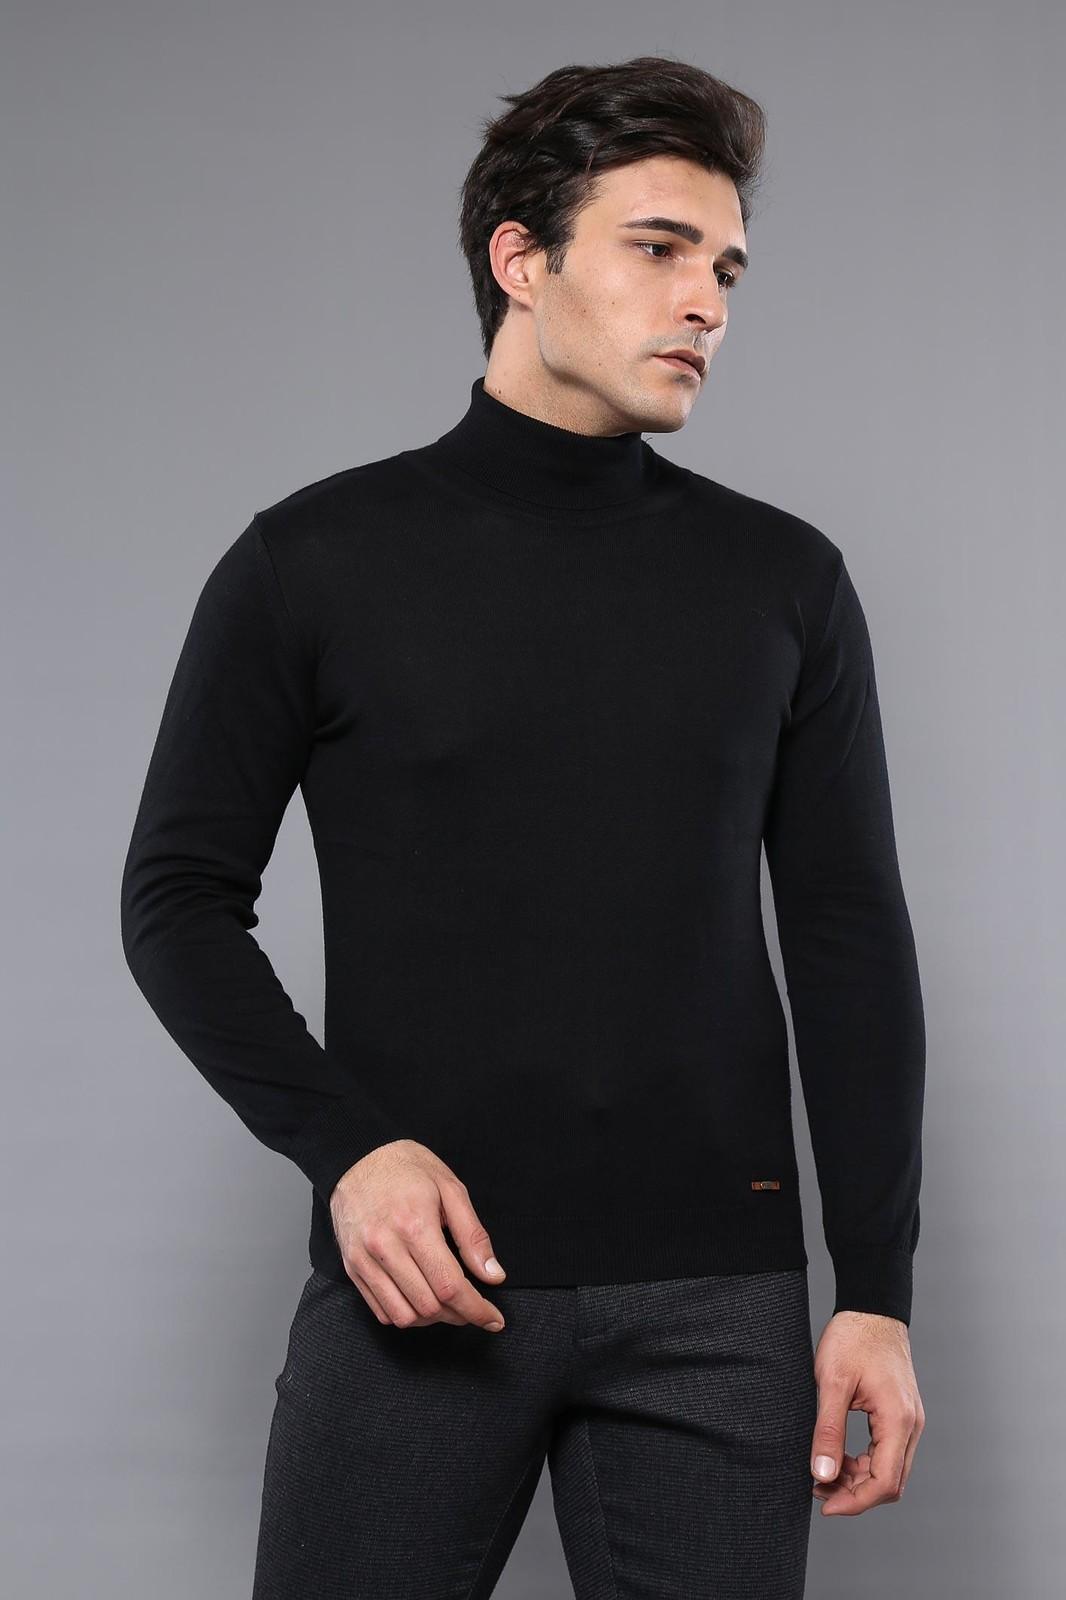 Men's Turtleneck Black Tricot Sweater